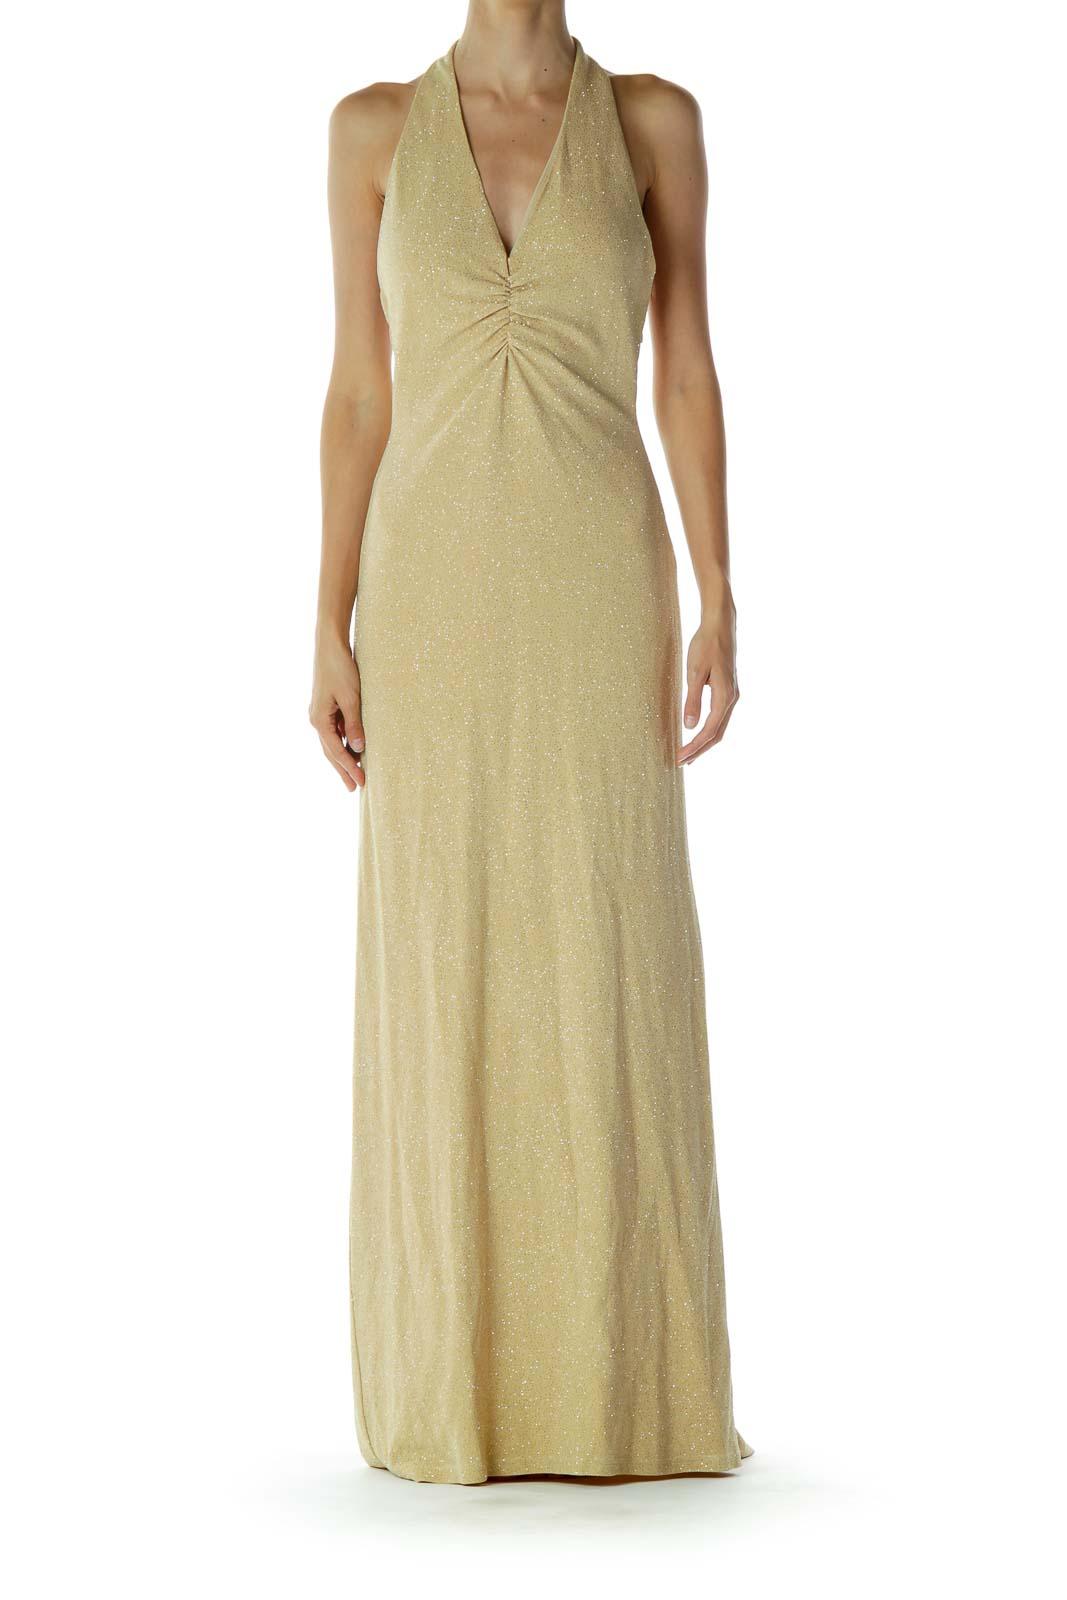 Gold Sparkly Evening Dress